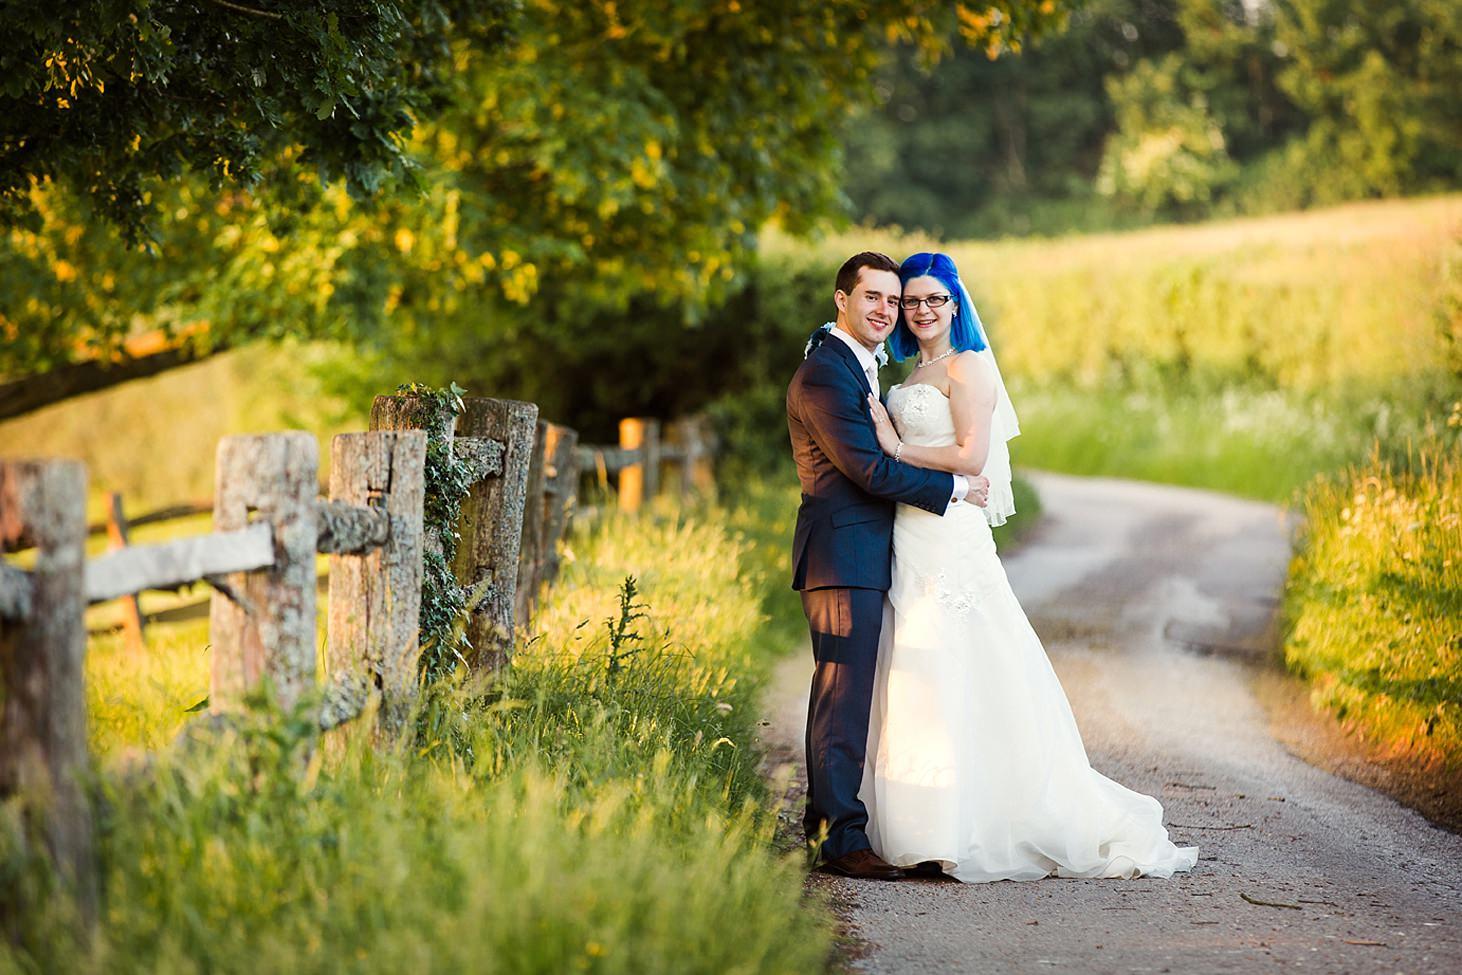 gate street barn wedding photography bride and groom portrait by gates